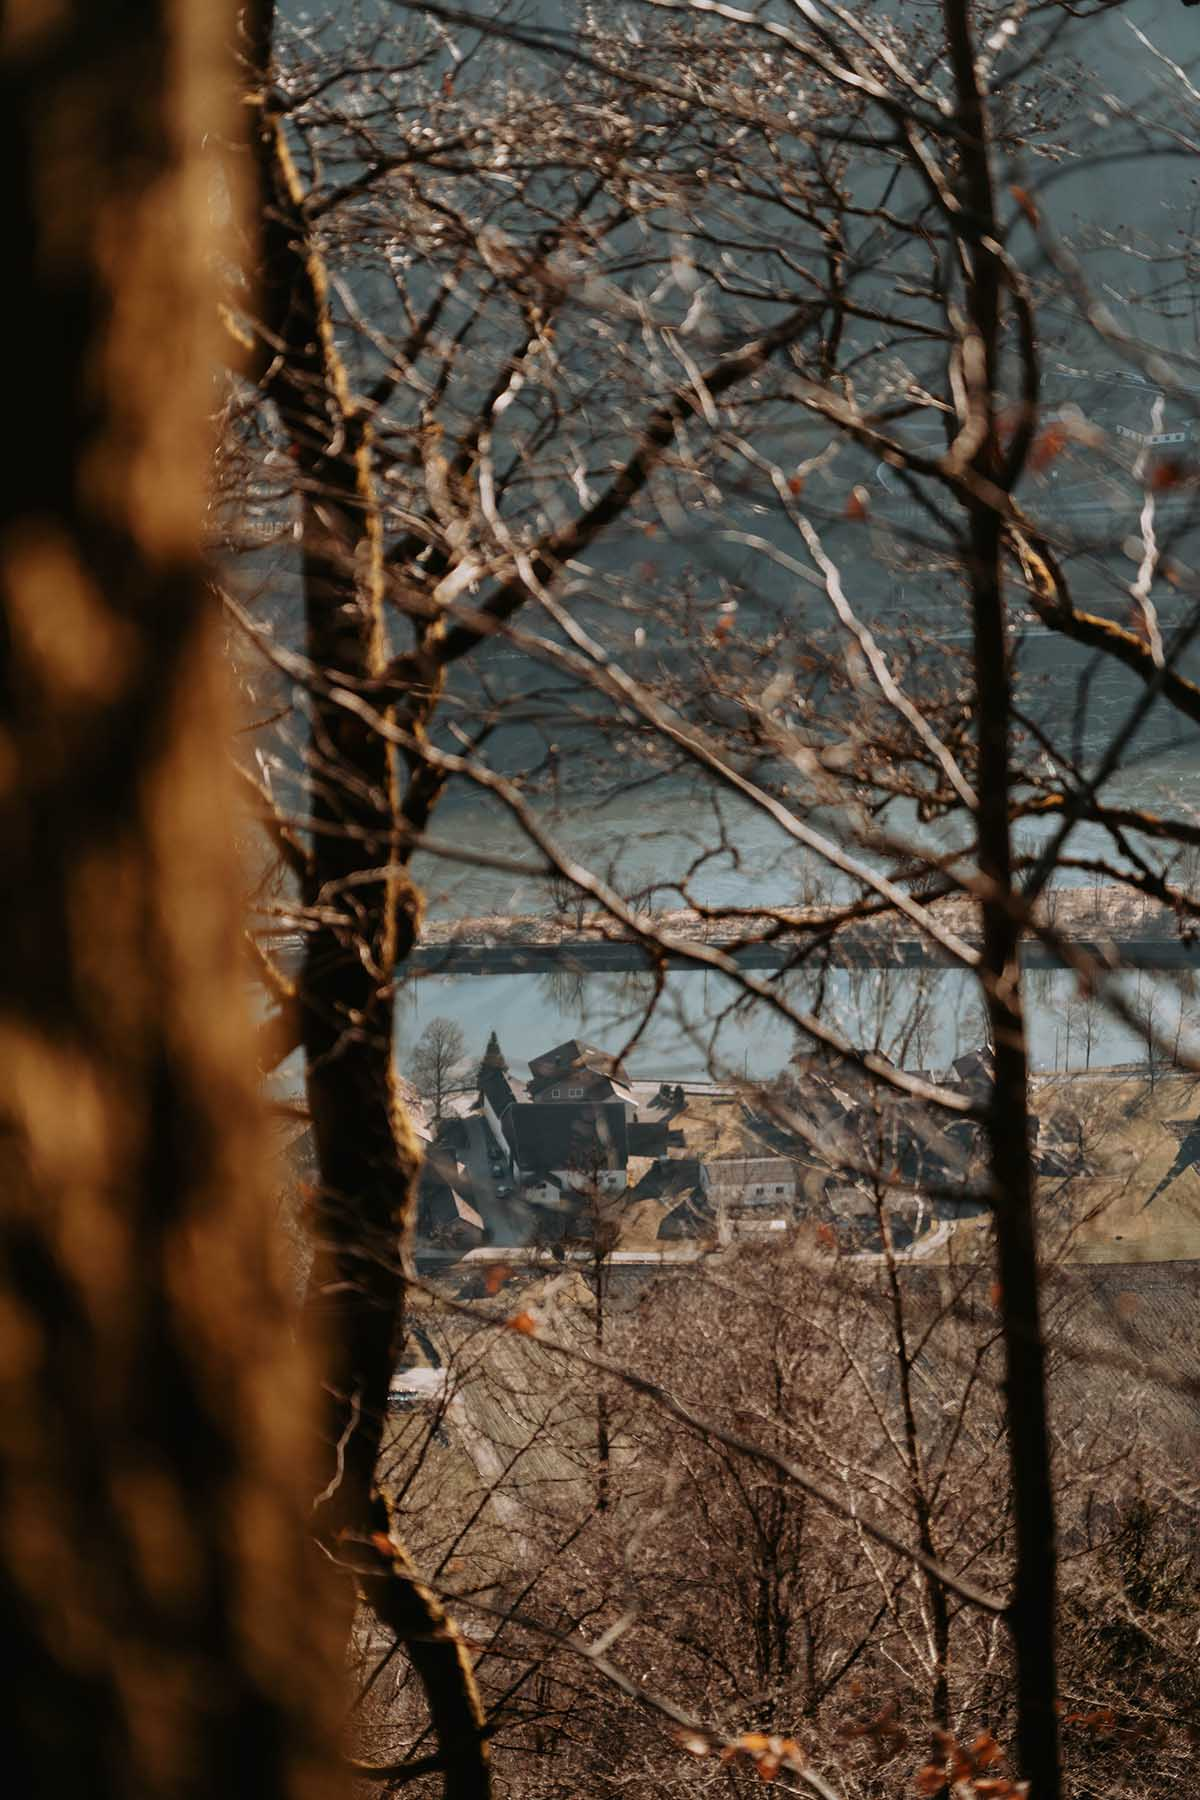 sonnenweg-donausteig-ebenstein-ausblick